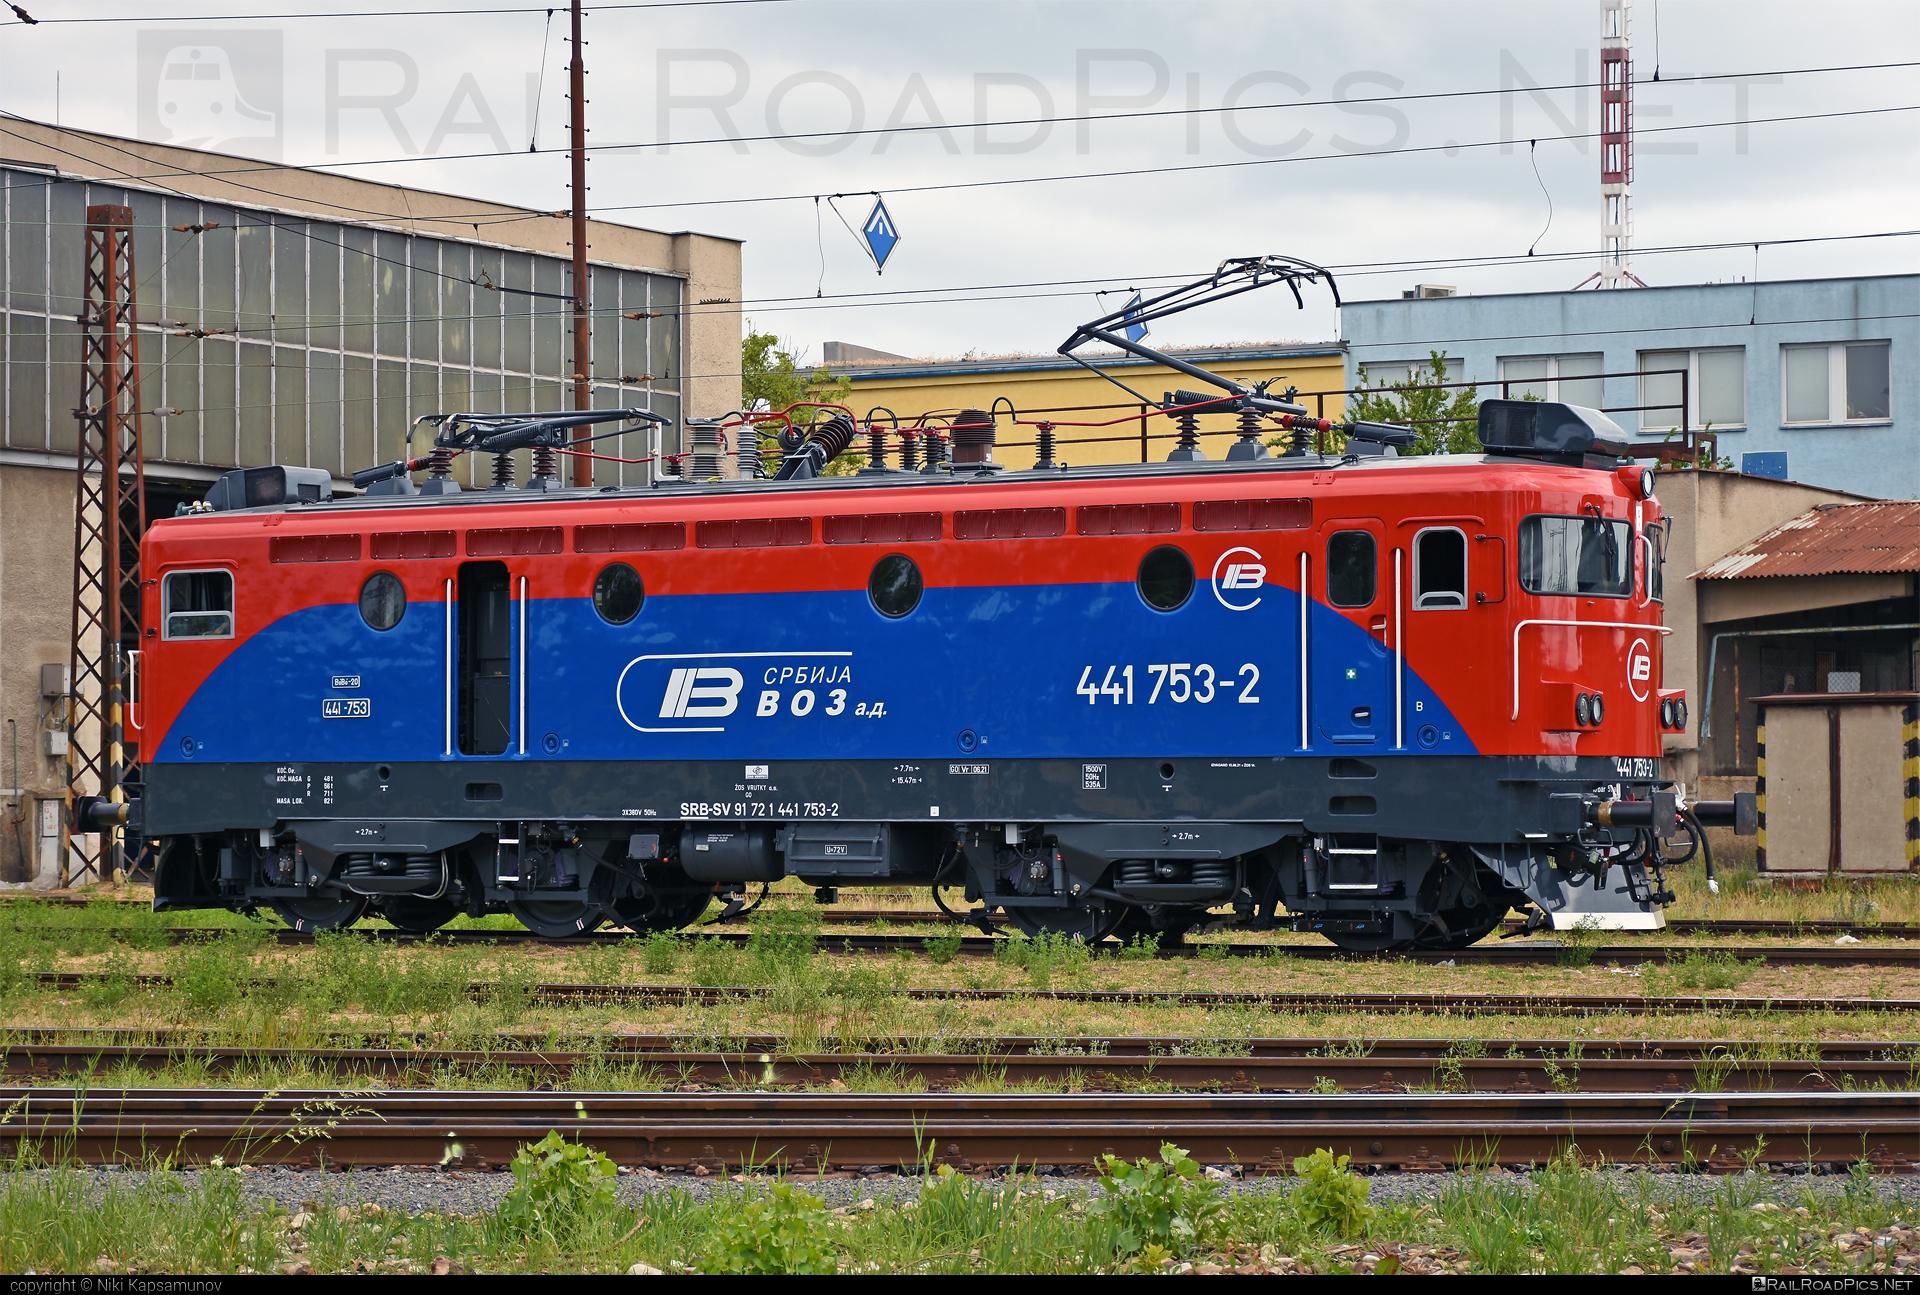 Končar JŽ class 441 - 441 753-2 operated by Srbija voz a.d. #jz441 #koncar #koncar441 #srbijavoz #srbijavozad